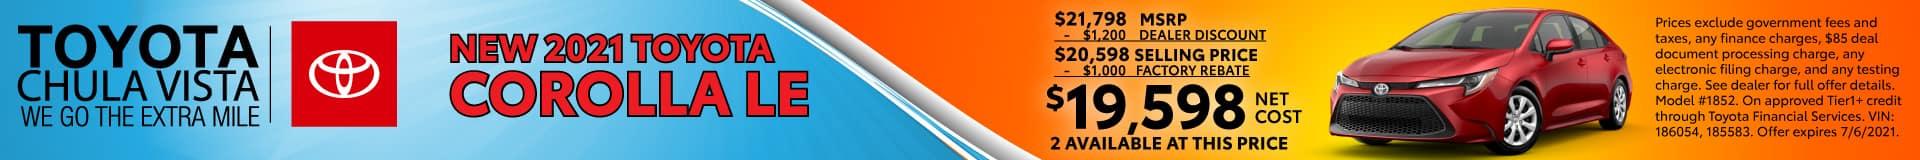 TCV_1920x160_Offers_Jul6_corolla_LE